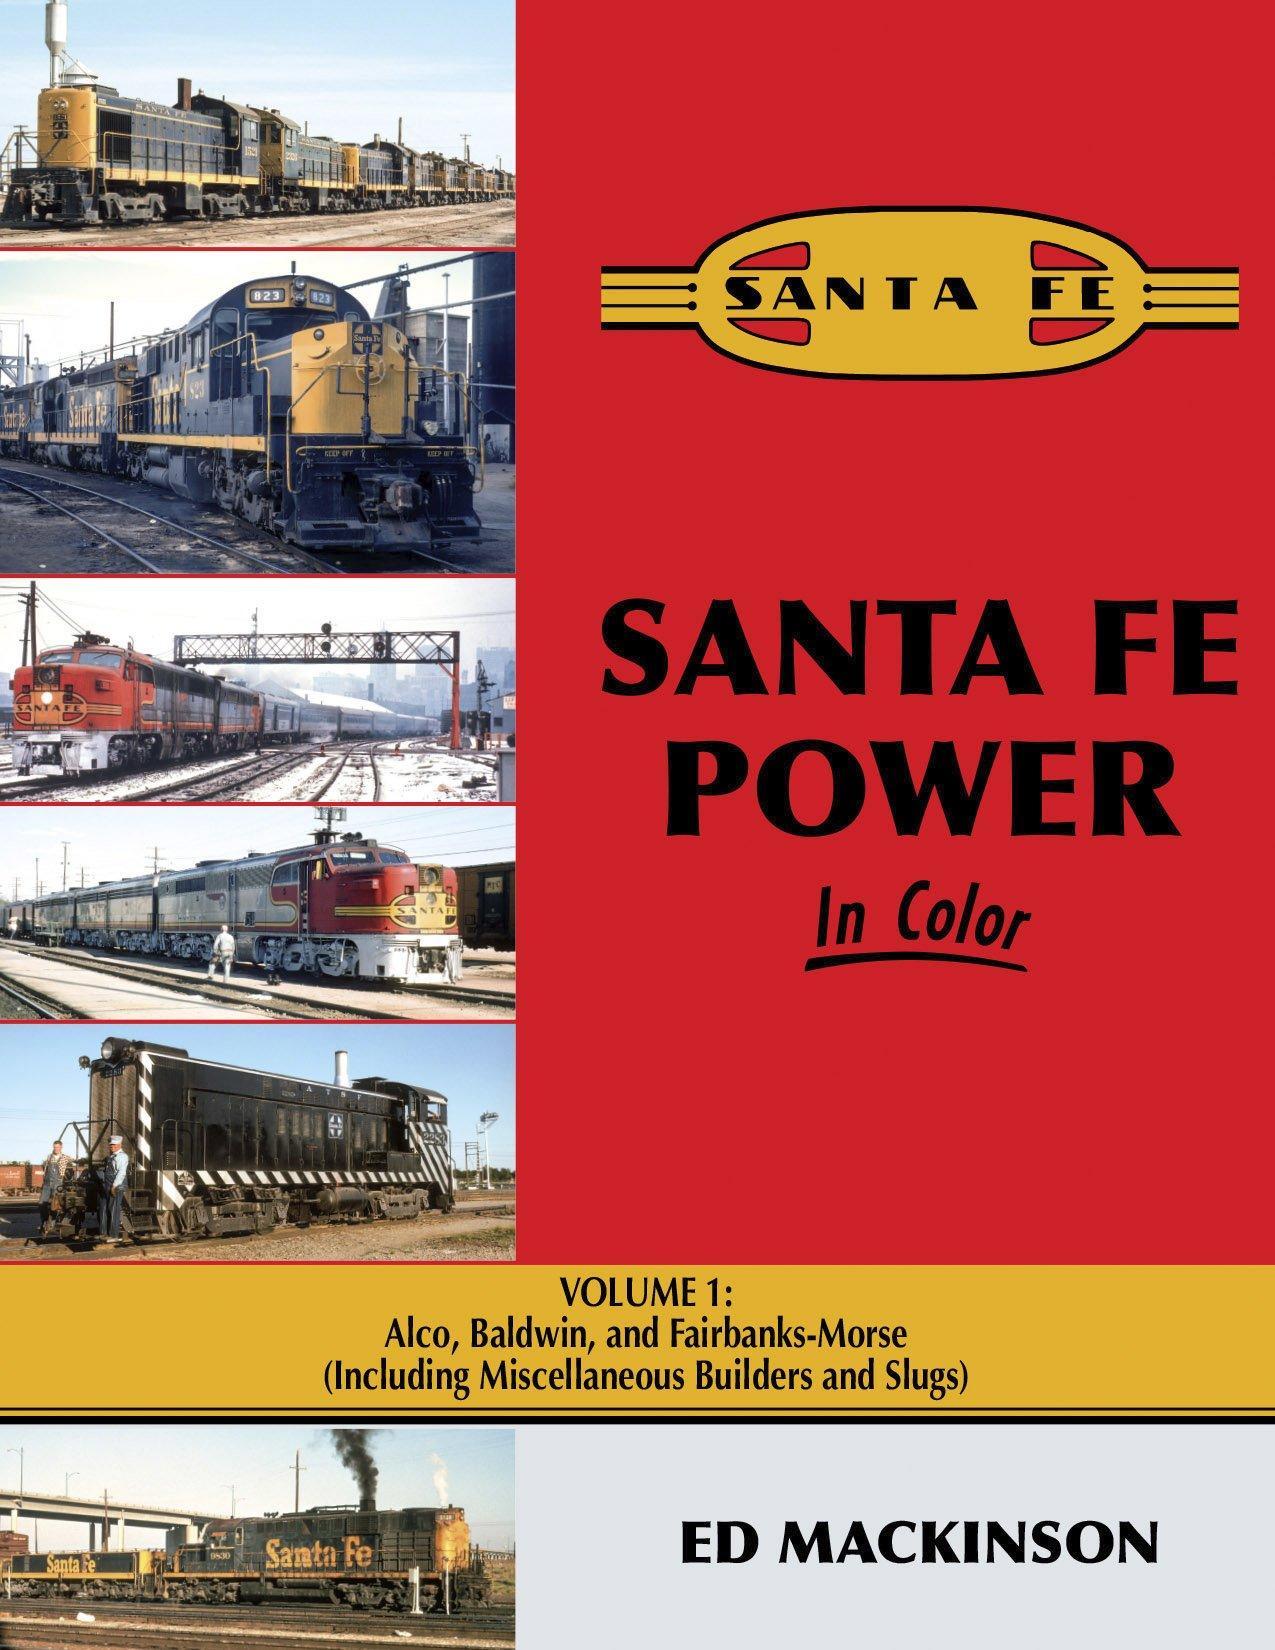 Santa Fe Power, Vol. 1